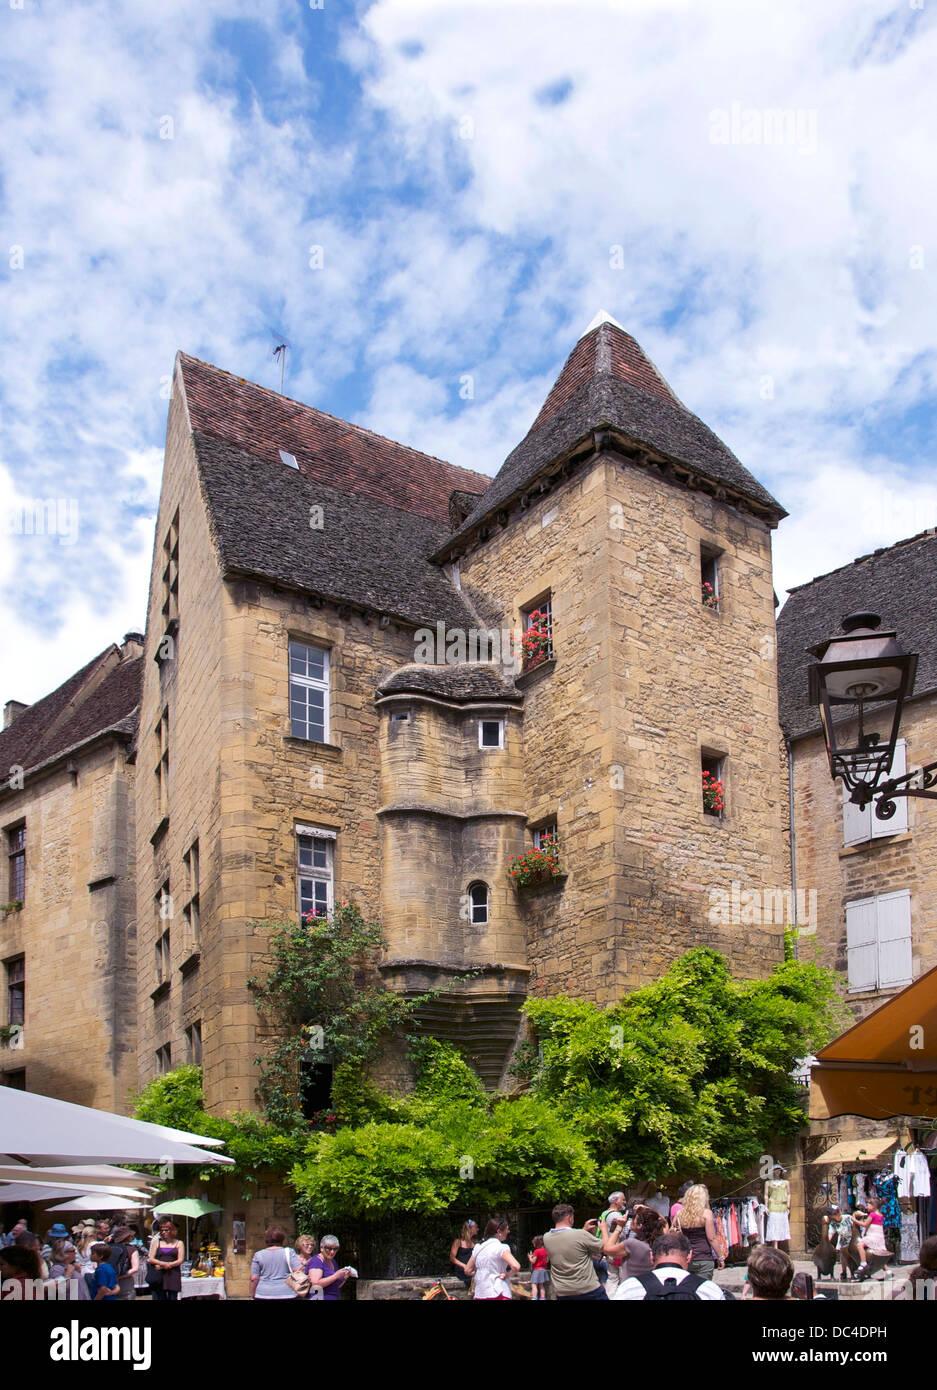 Hôtel de Vassal, 15th century, Sarlat-la-Canéda, Dordogne, France. - Stock Image